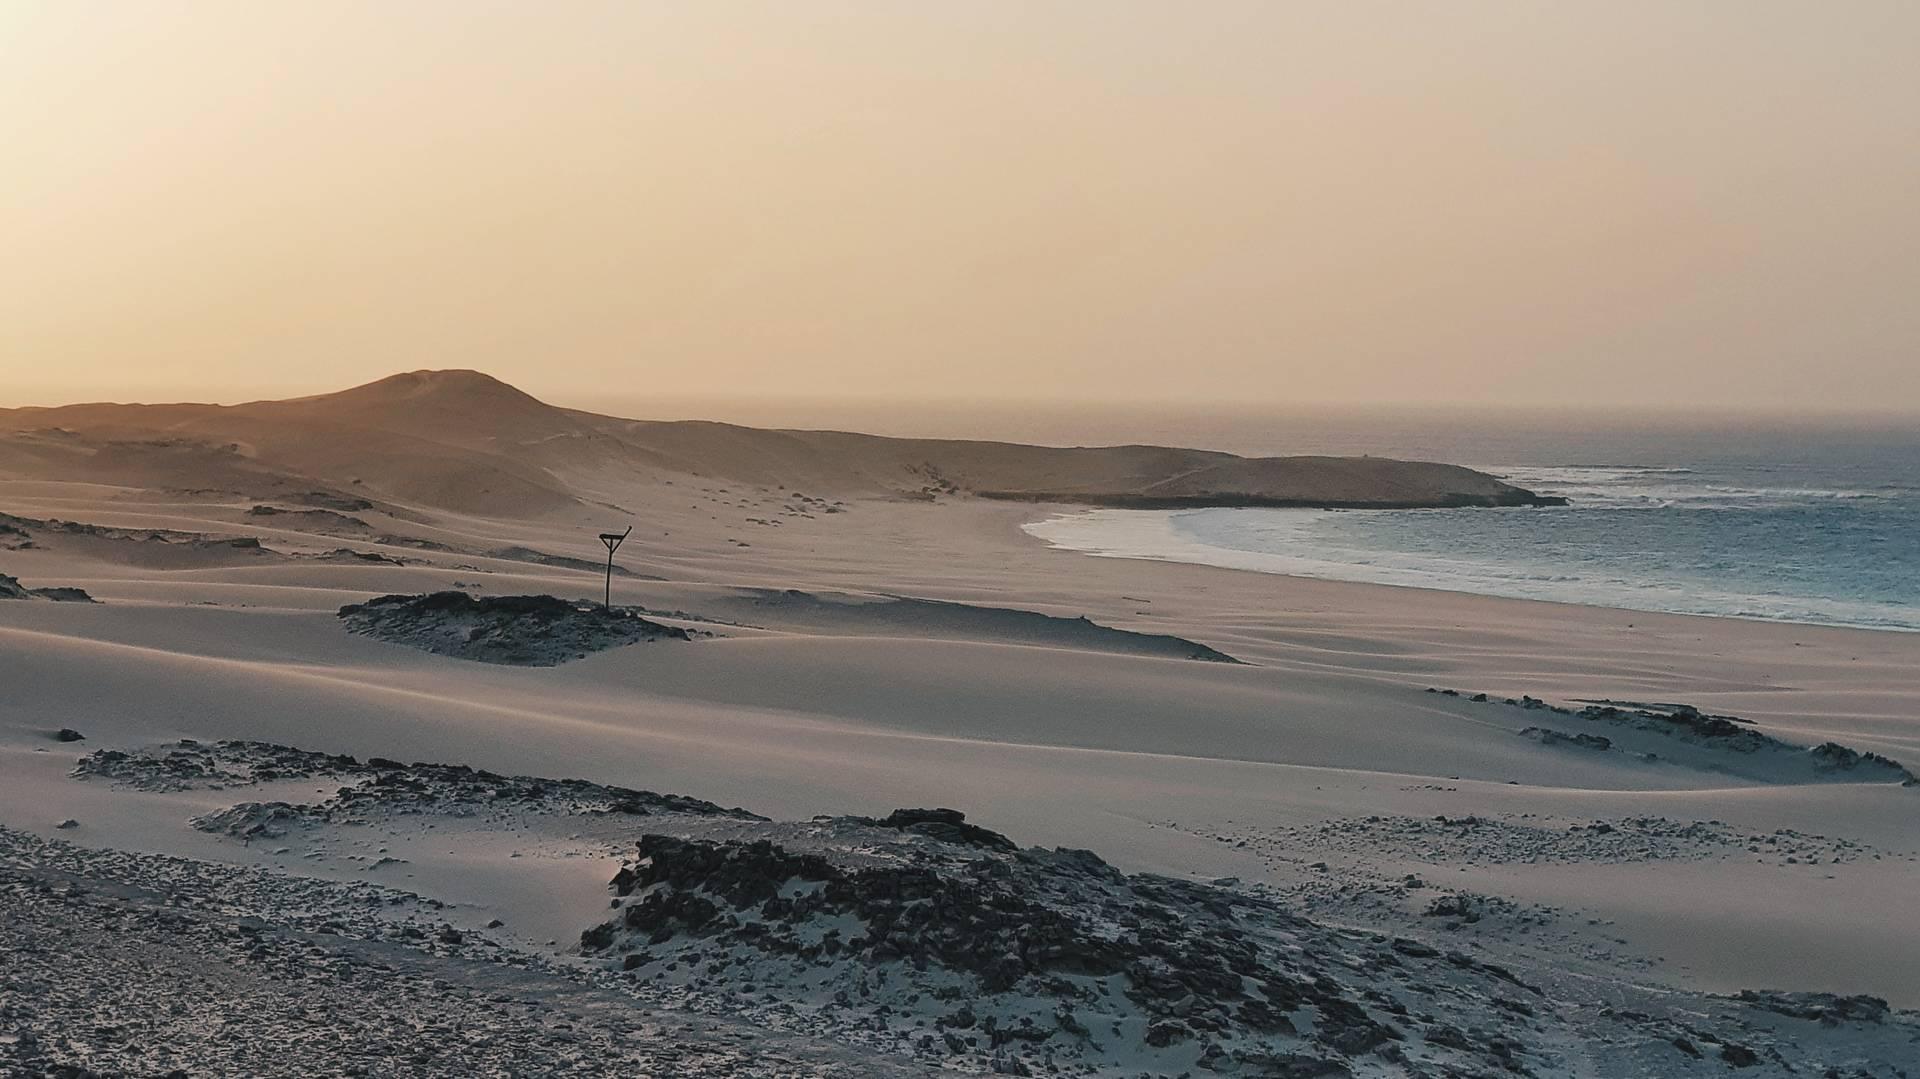 Kaapverdie Boa Vista strand kaapverdie introductie